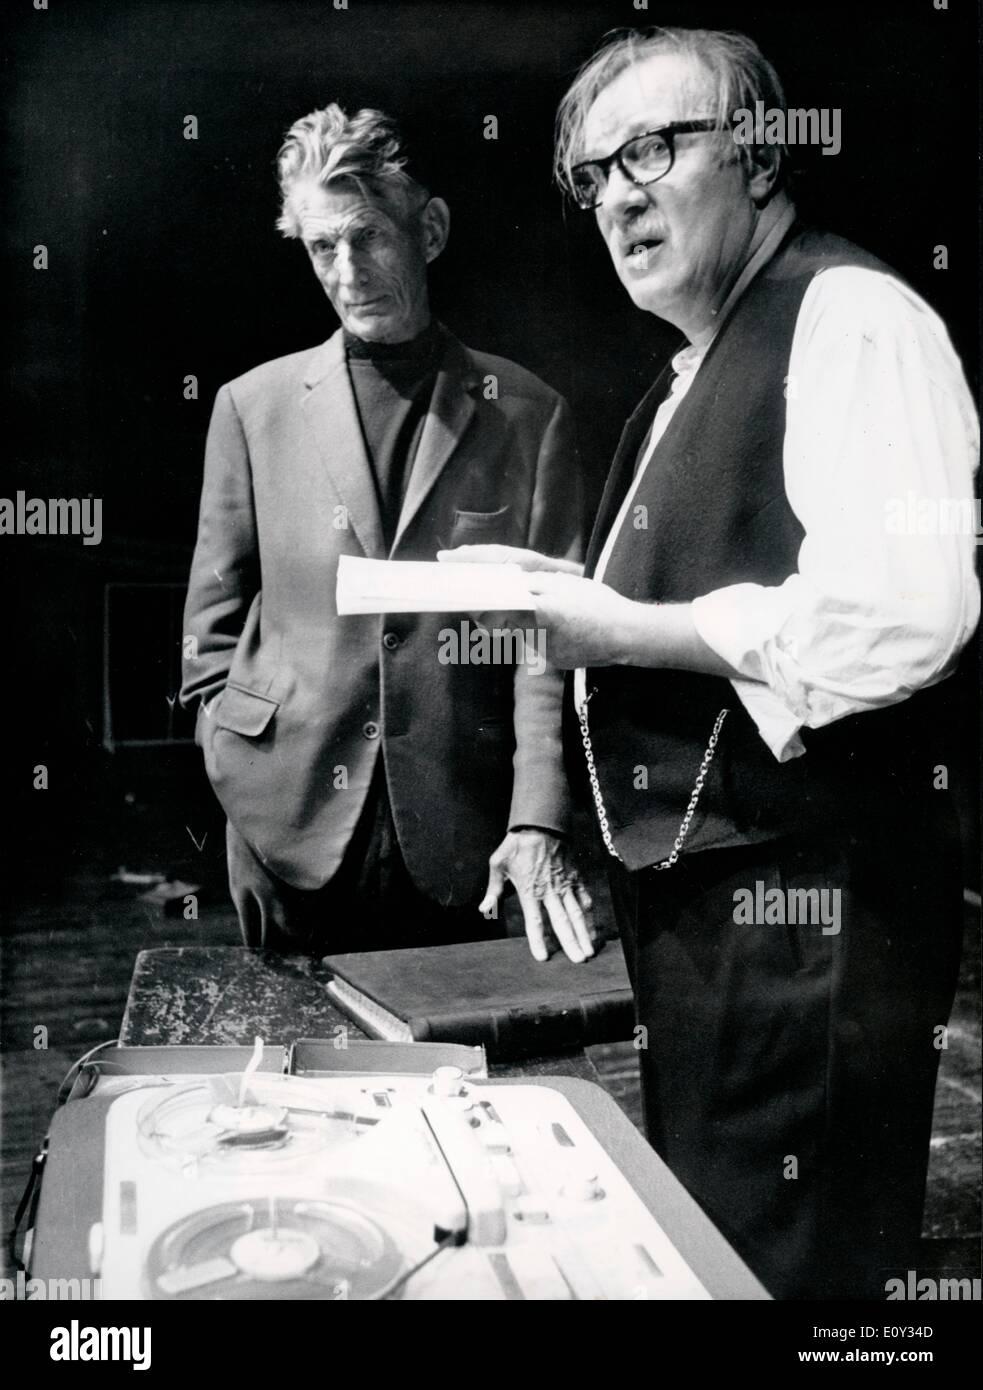 Playwright Samuel Beckett with Martin Held - Stock Image